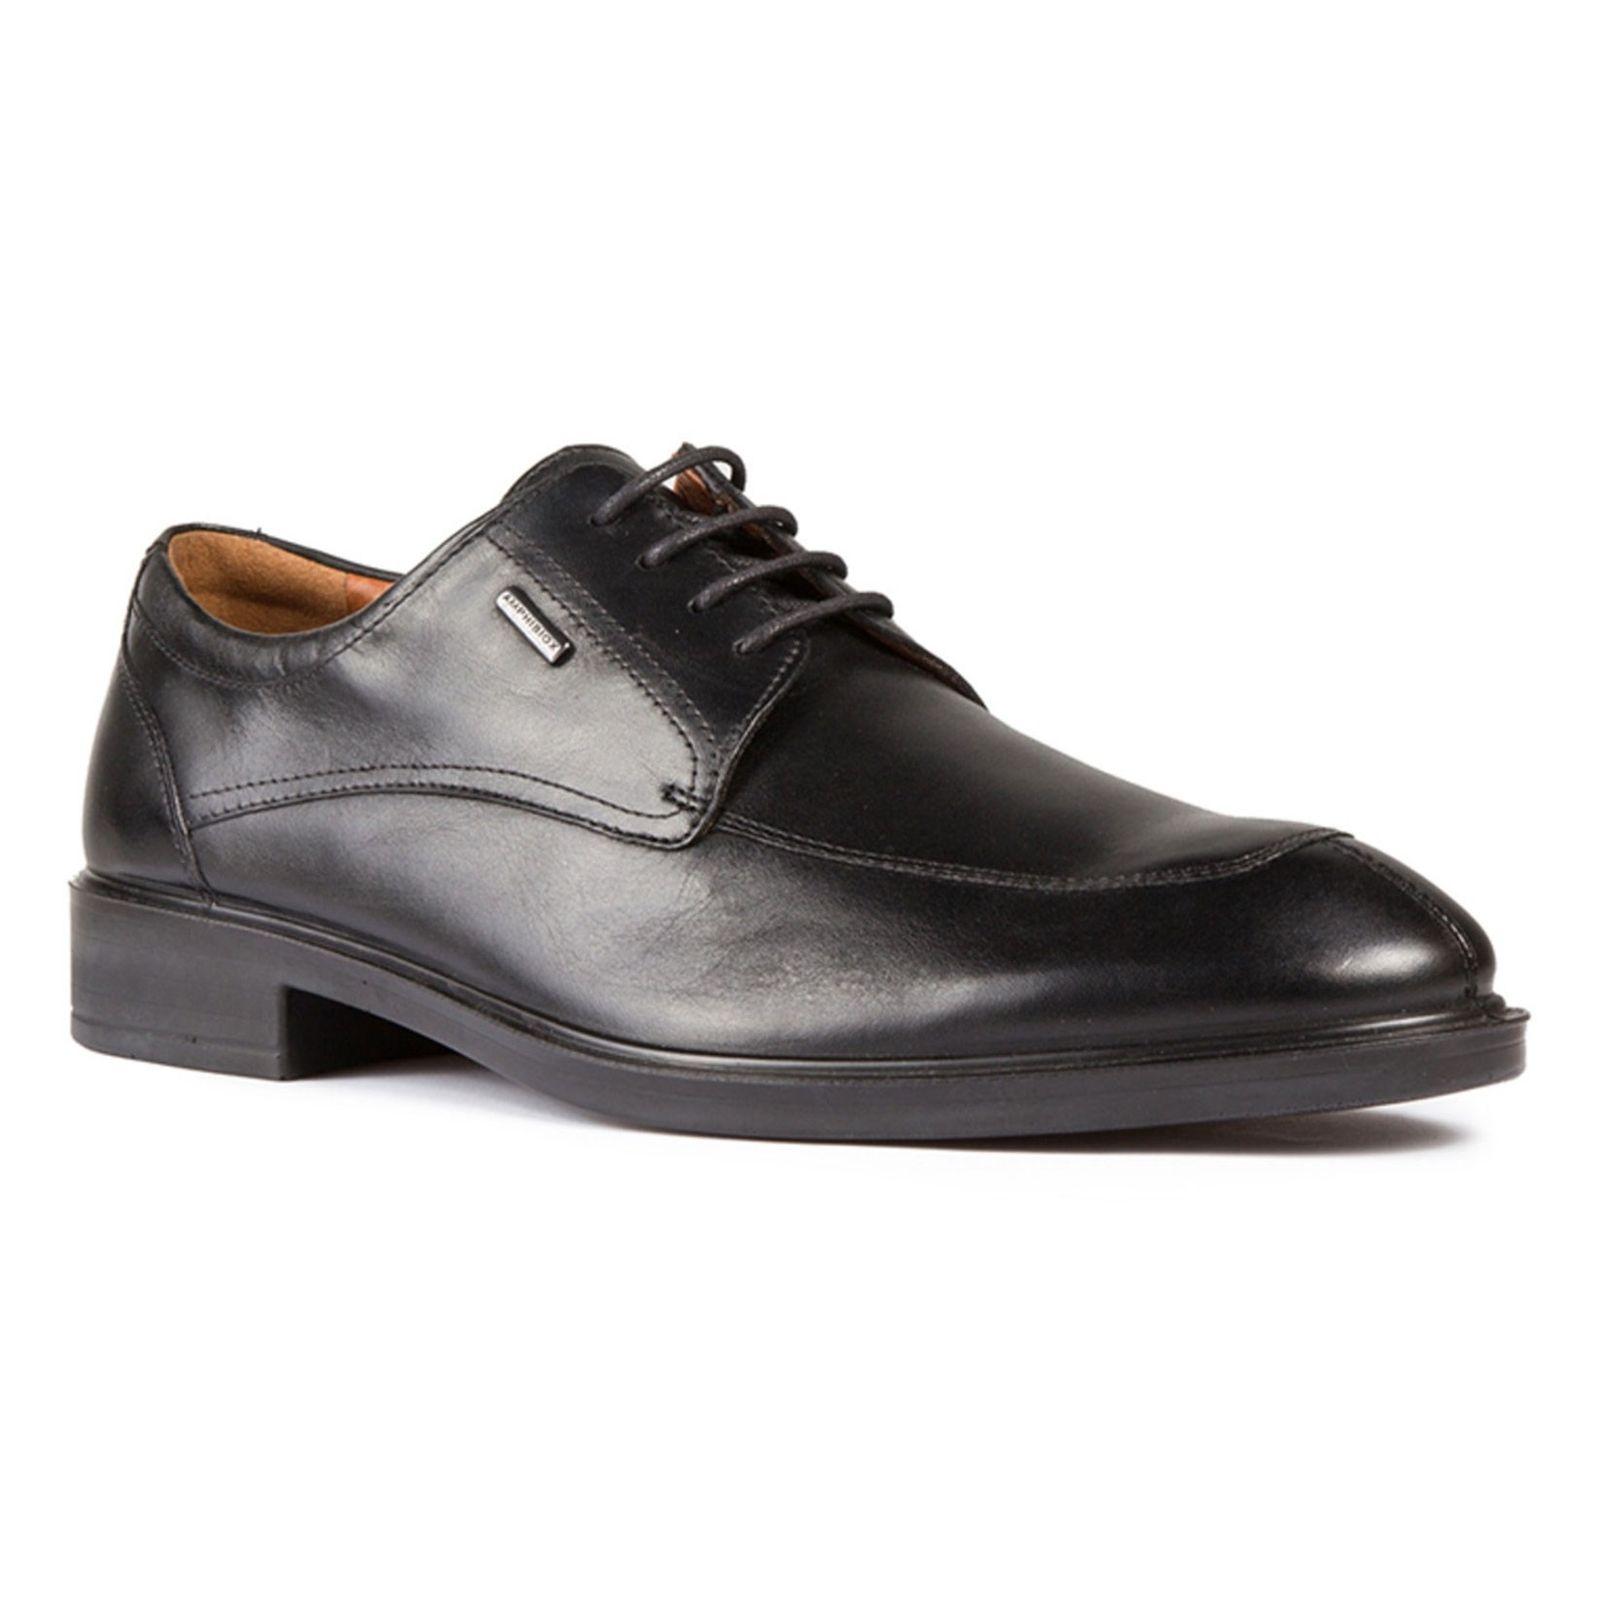 کفش رسمی چرم مردانه - جی اوکس - مشکي - 2